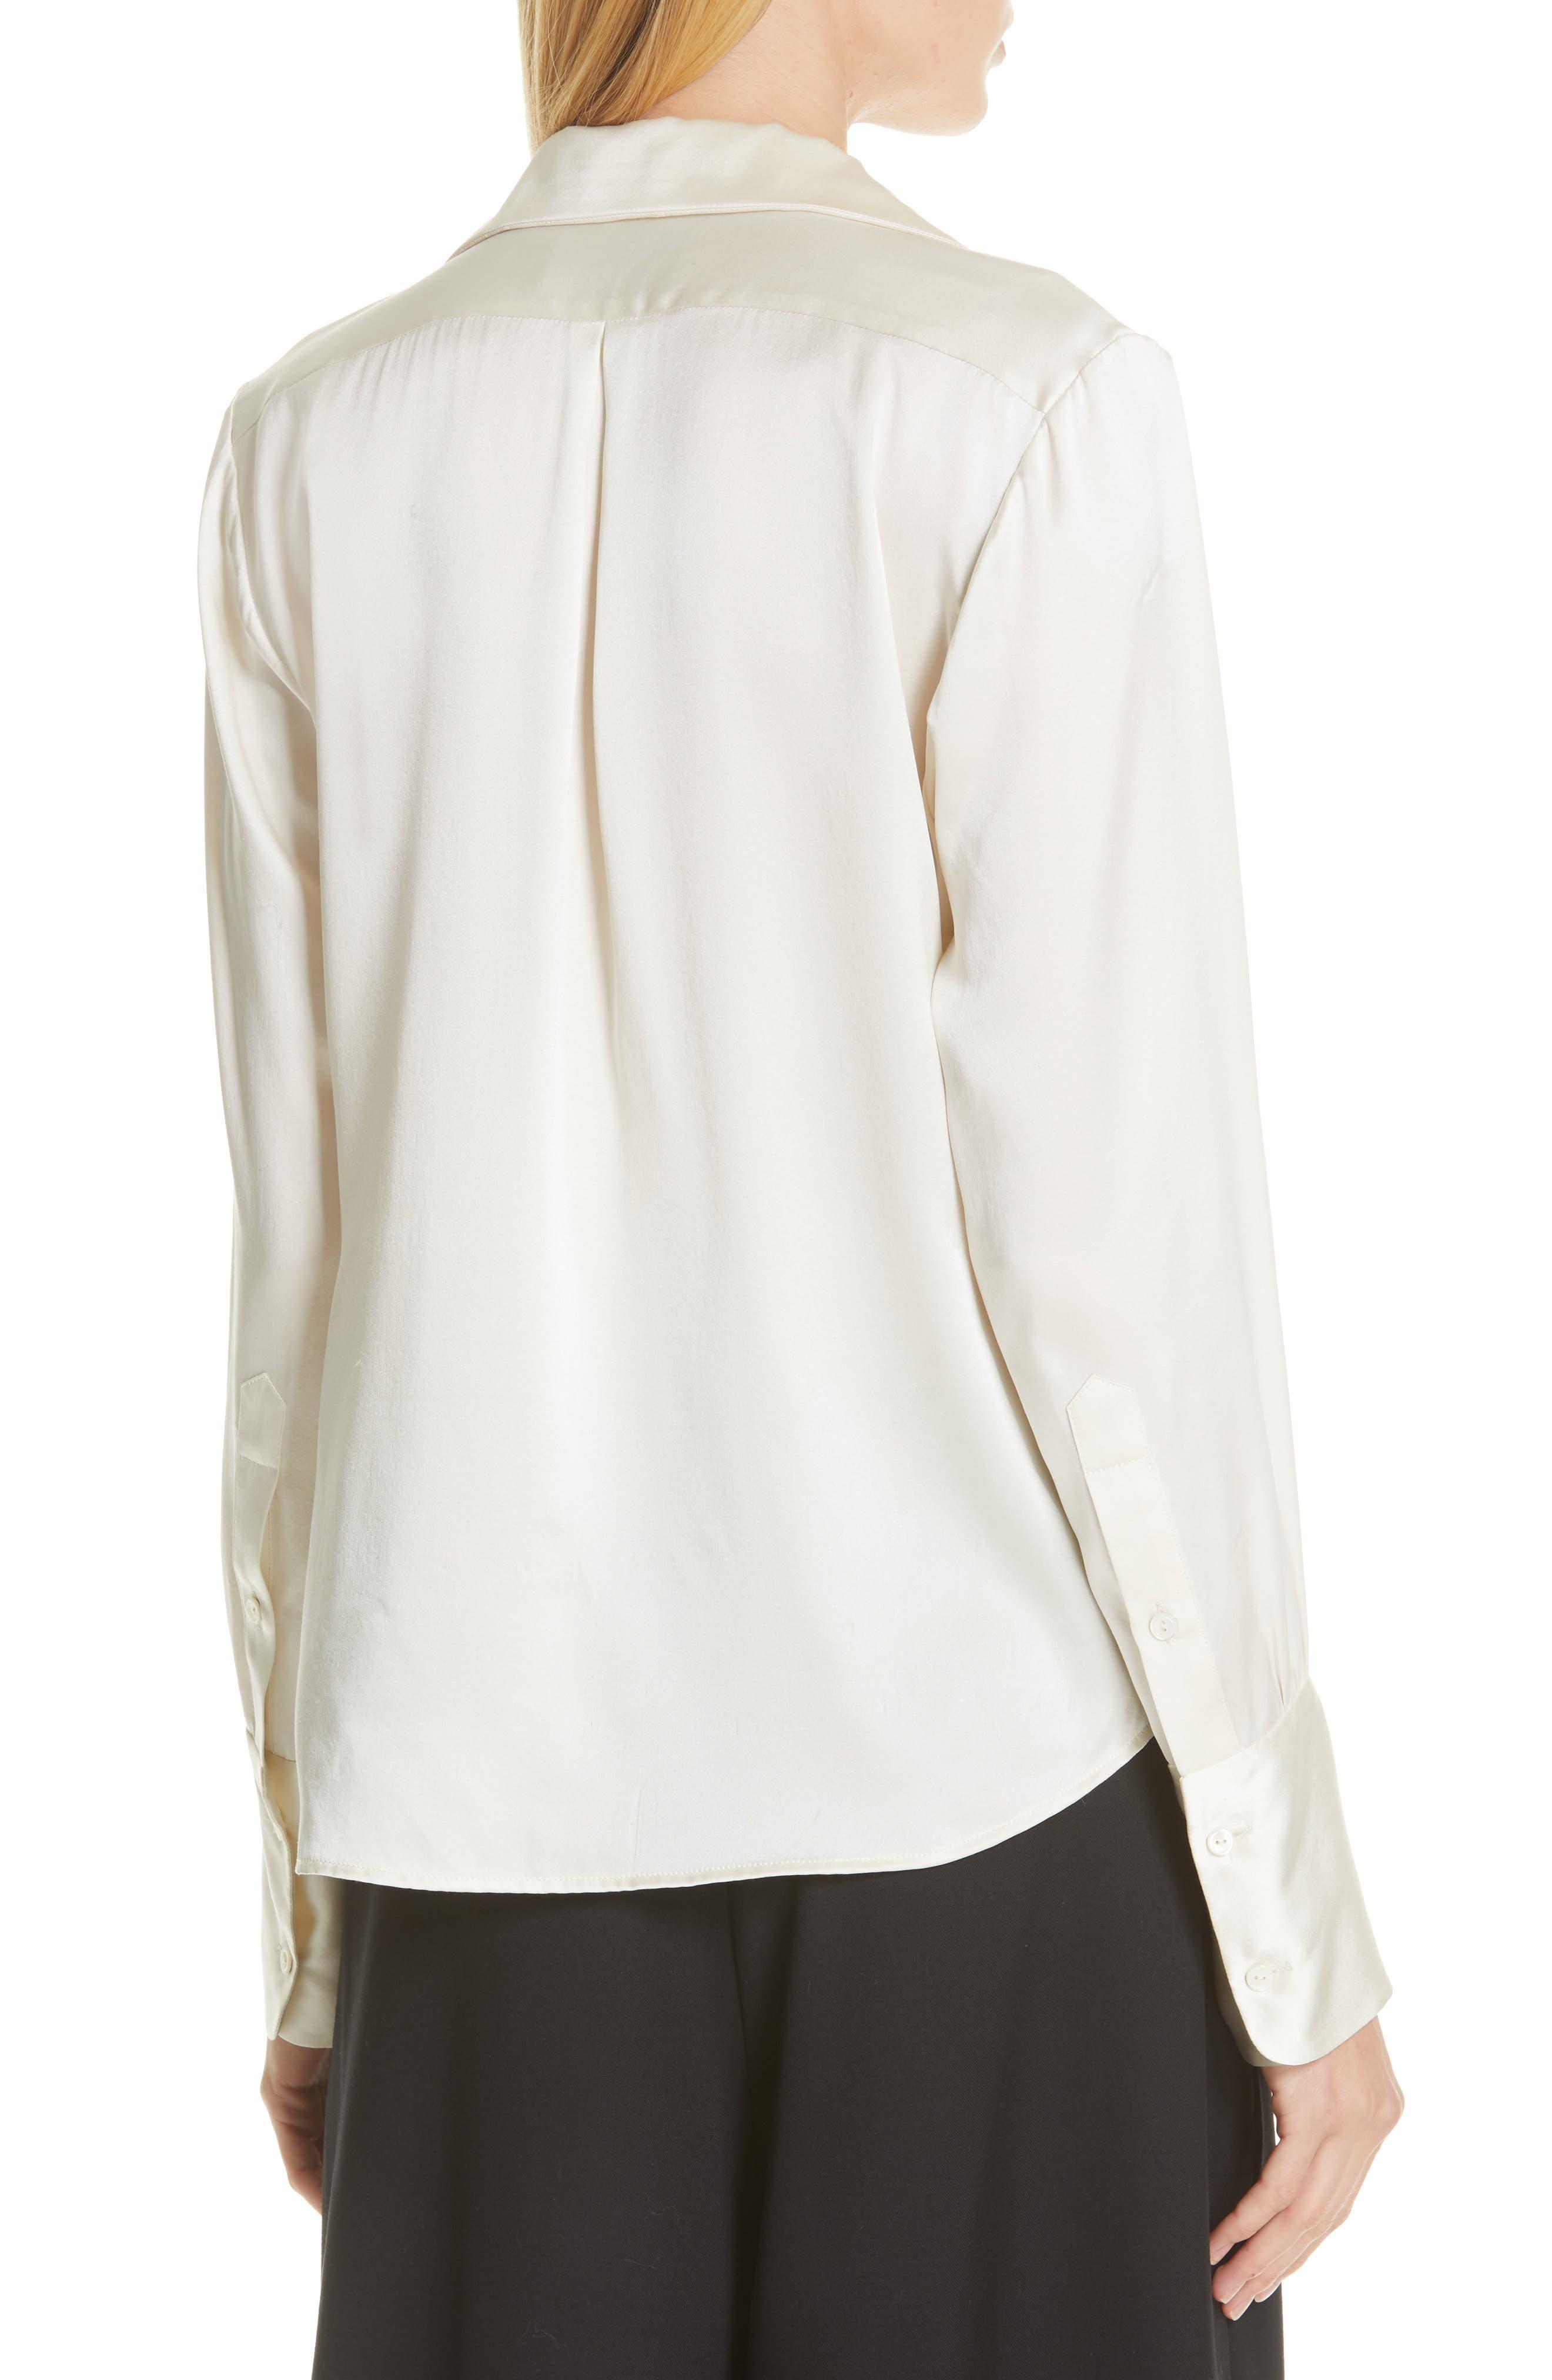 NILI LOTAN, Emmen Silk Shirt, Alternate thumbnail 2, color, IVORY